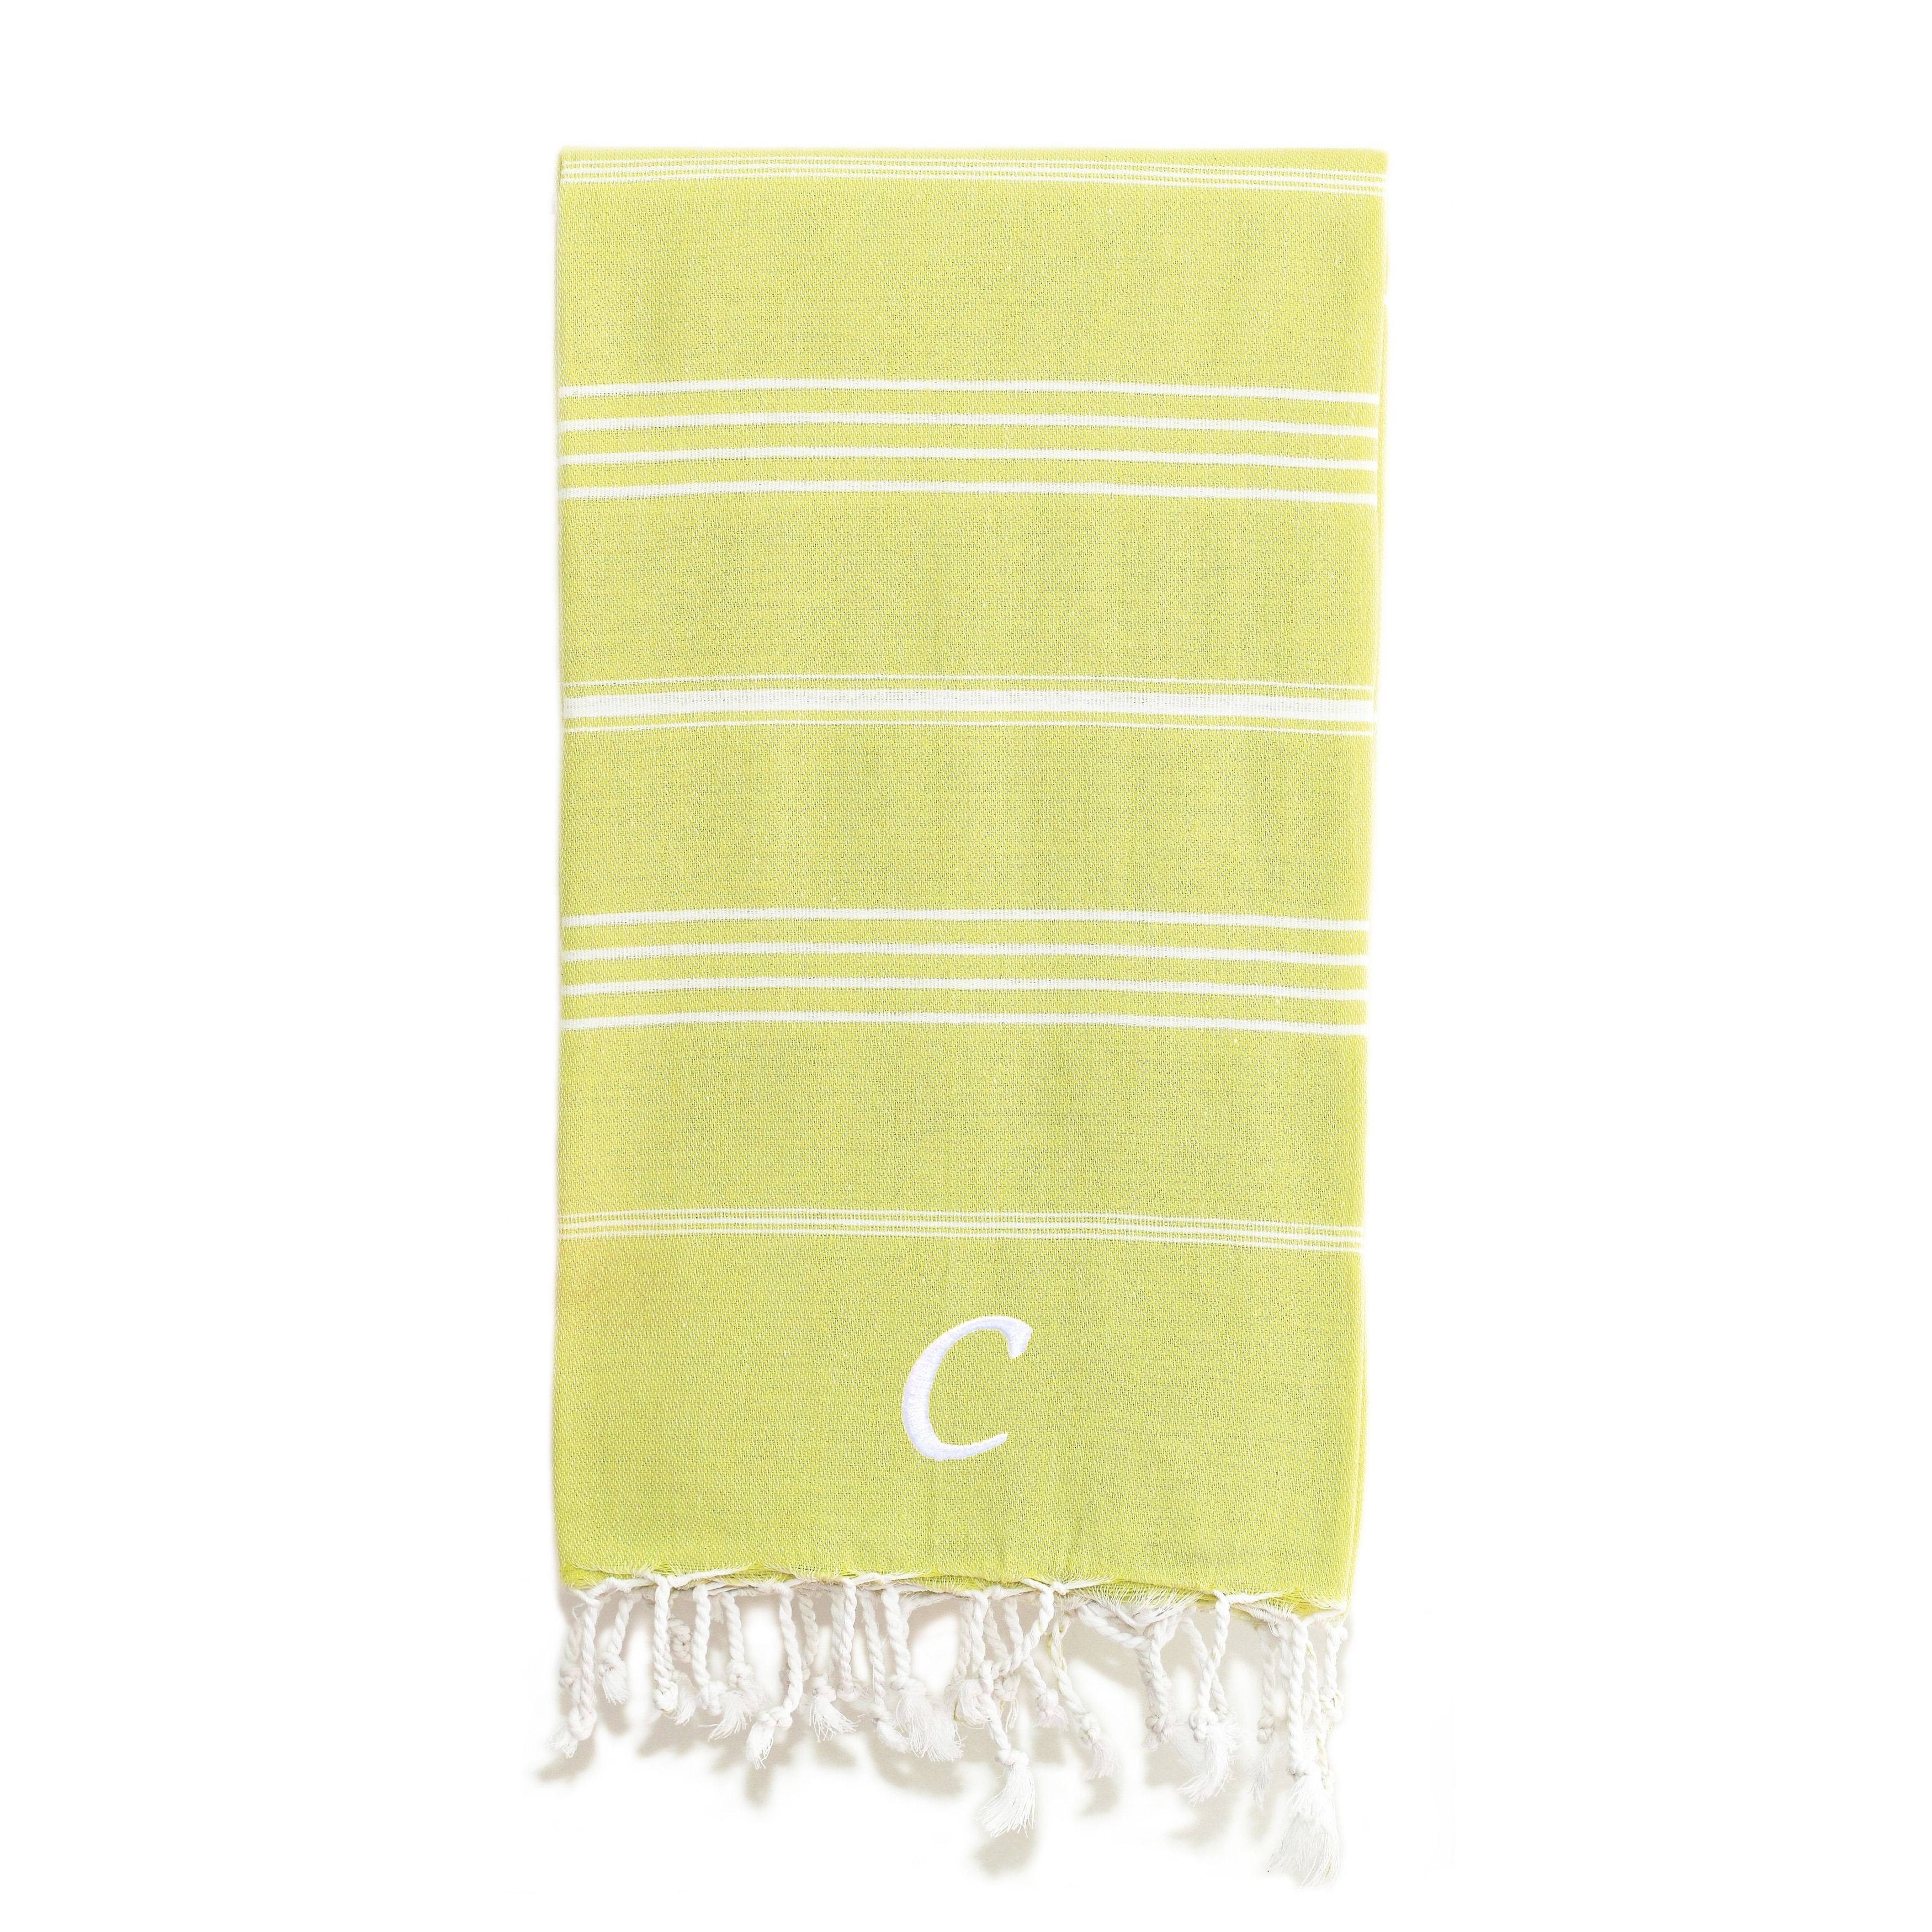 Authentic Pestemal Fouta Original Lime Green And White Striped Turkish Cotton Bath Beach Towel With Monogram Initial Lime Green White E Turkish Cotton Towels Monogram Initials Beach Towel